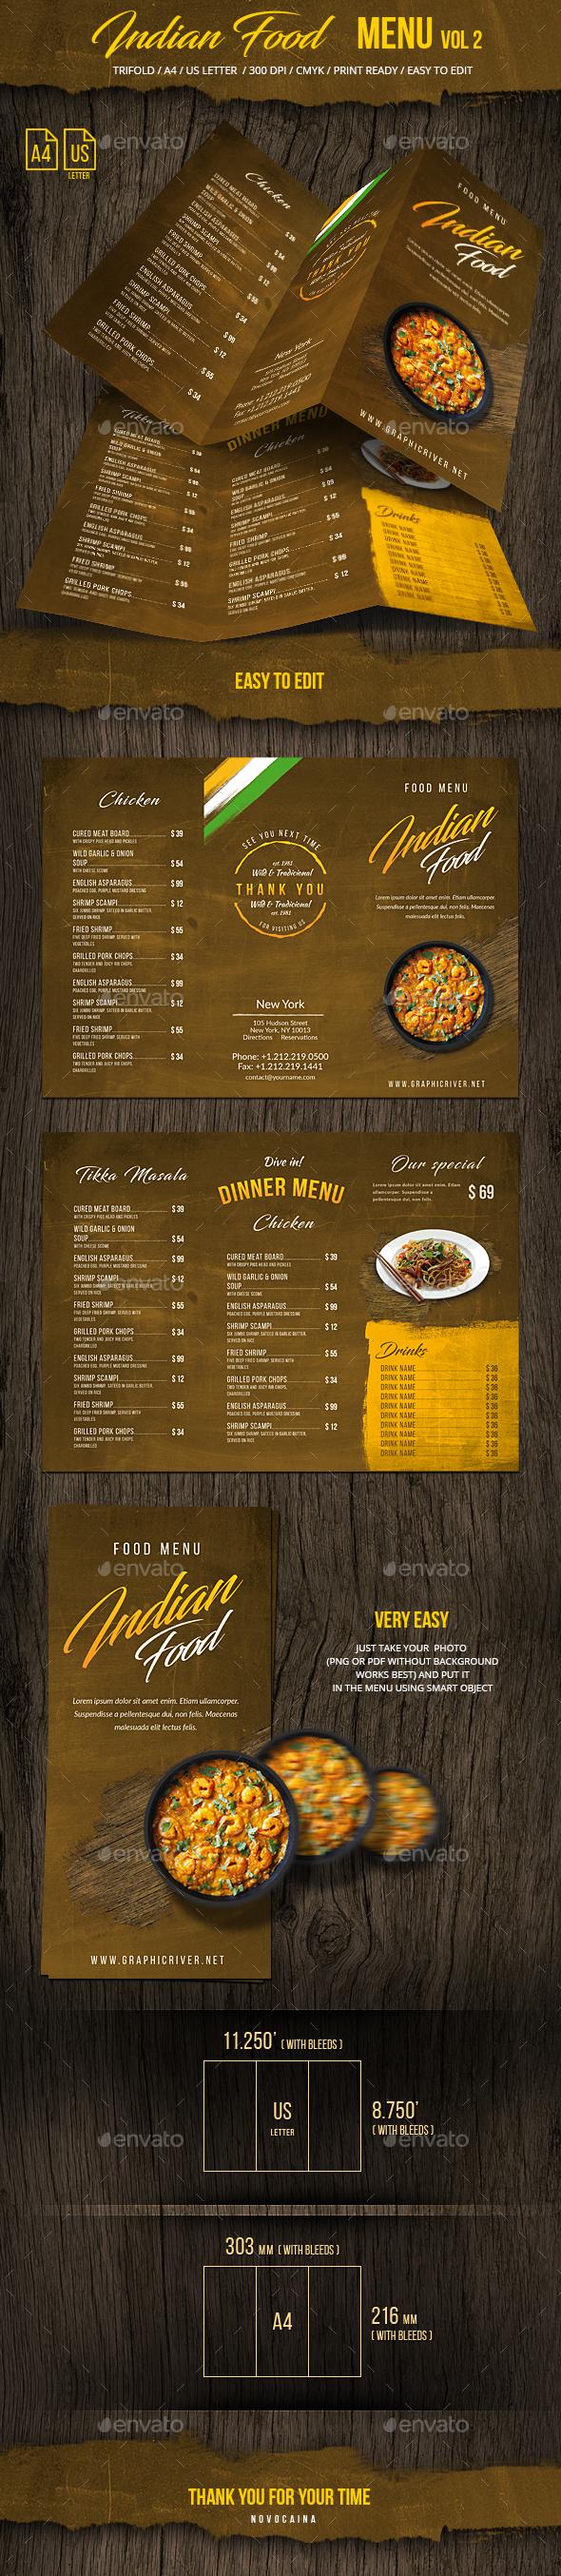 Indian Food Menu A4 & US Letter Vol 2 - Food Menus Print Templates